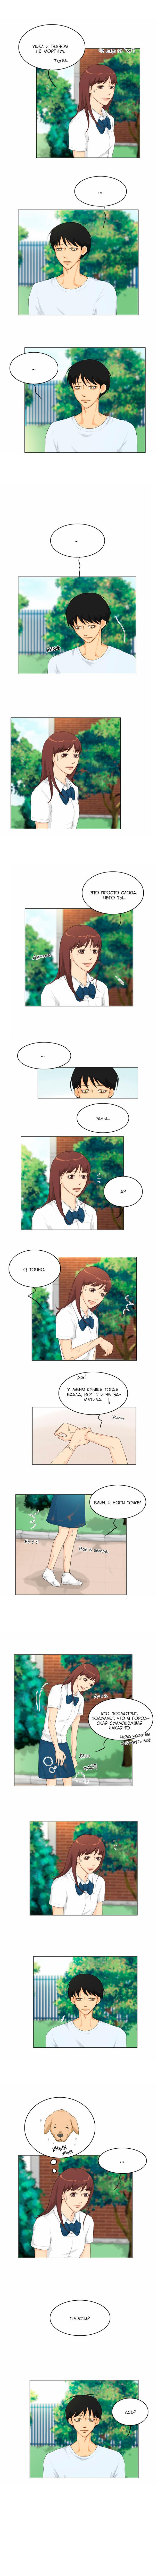 https://r1.ninemanga.com/comics/pic2/8/31048/426339/1535044244586.jpg Page 5